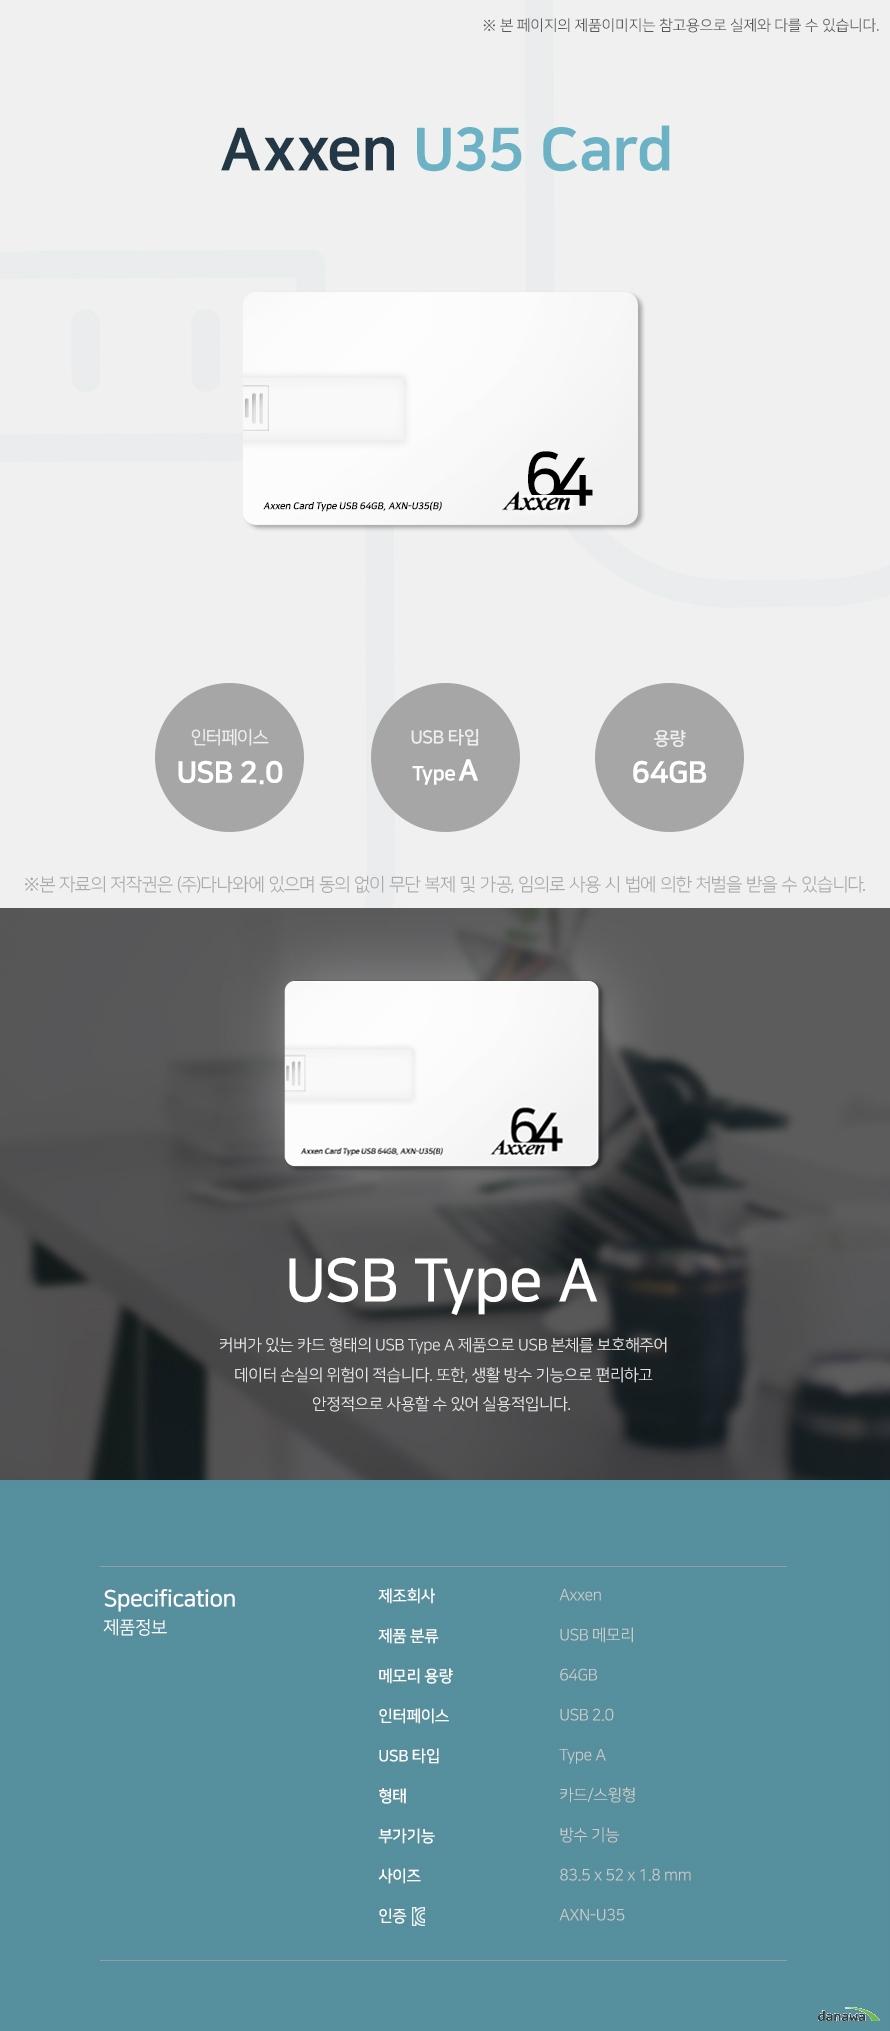 Axxen U35 Card 64GB USB Type A 커버가 있는 카드 형태의 USB Type A 제품으로 USB 본체를 보호해주어 데이터 손실의 의험이 적습니다. 또한, 생활 방수 기능으로 편리하고 안정적으로 사용할 수 있어 실용적입니다. 스펙 제조회사 AXXEN 제품 분류 USB 메모리 메모리 용량 64GB 인터페이스 USB 2.0 USB 타입 Type A 형태 카드/스윙형 부가기능 방수 기능 사이즈 83.5x52x1.8mm KC인증 AXN-U35